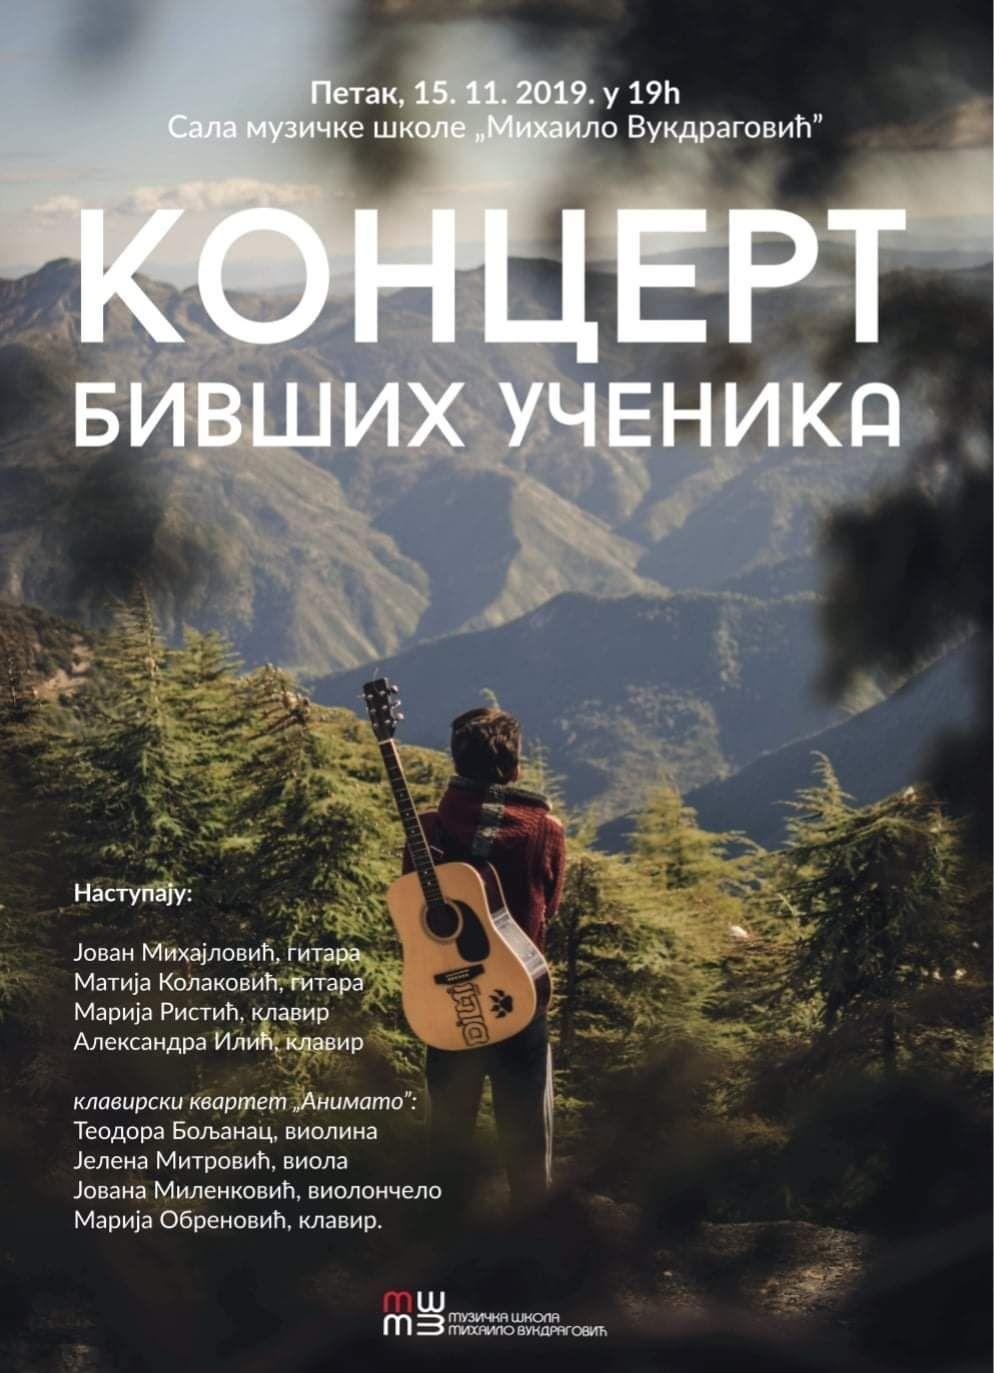 Koncert bivših učenika